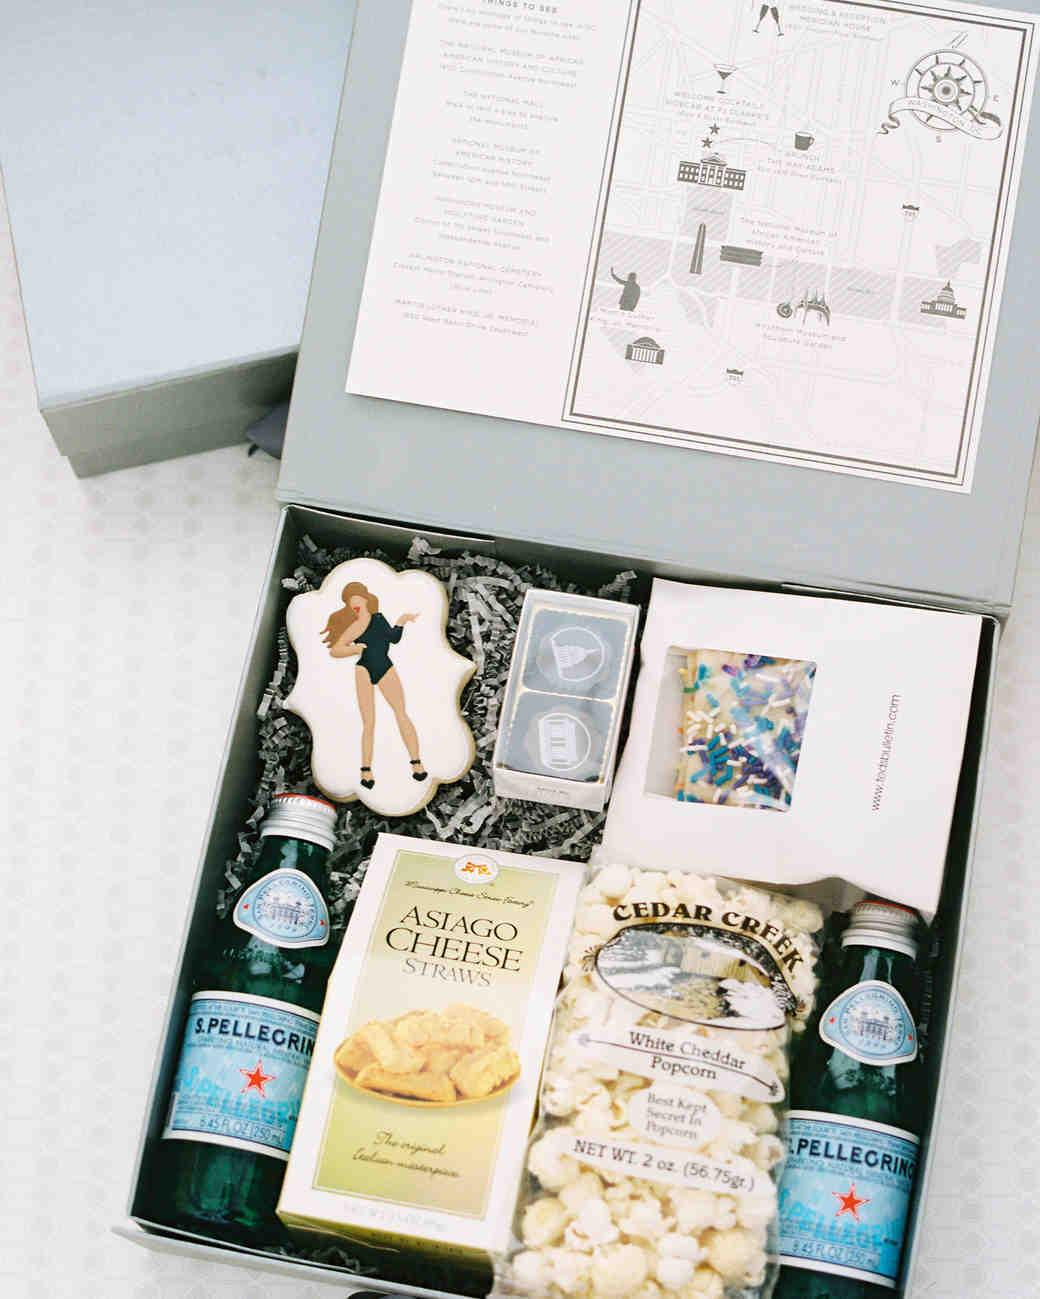 jermaine scott wedding dc welcome box